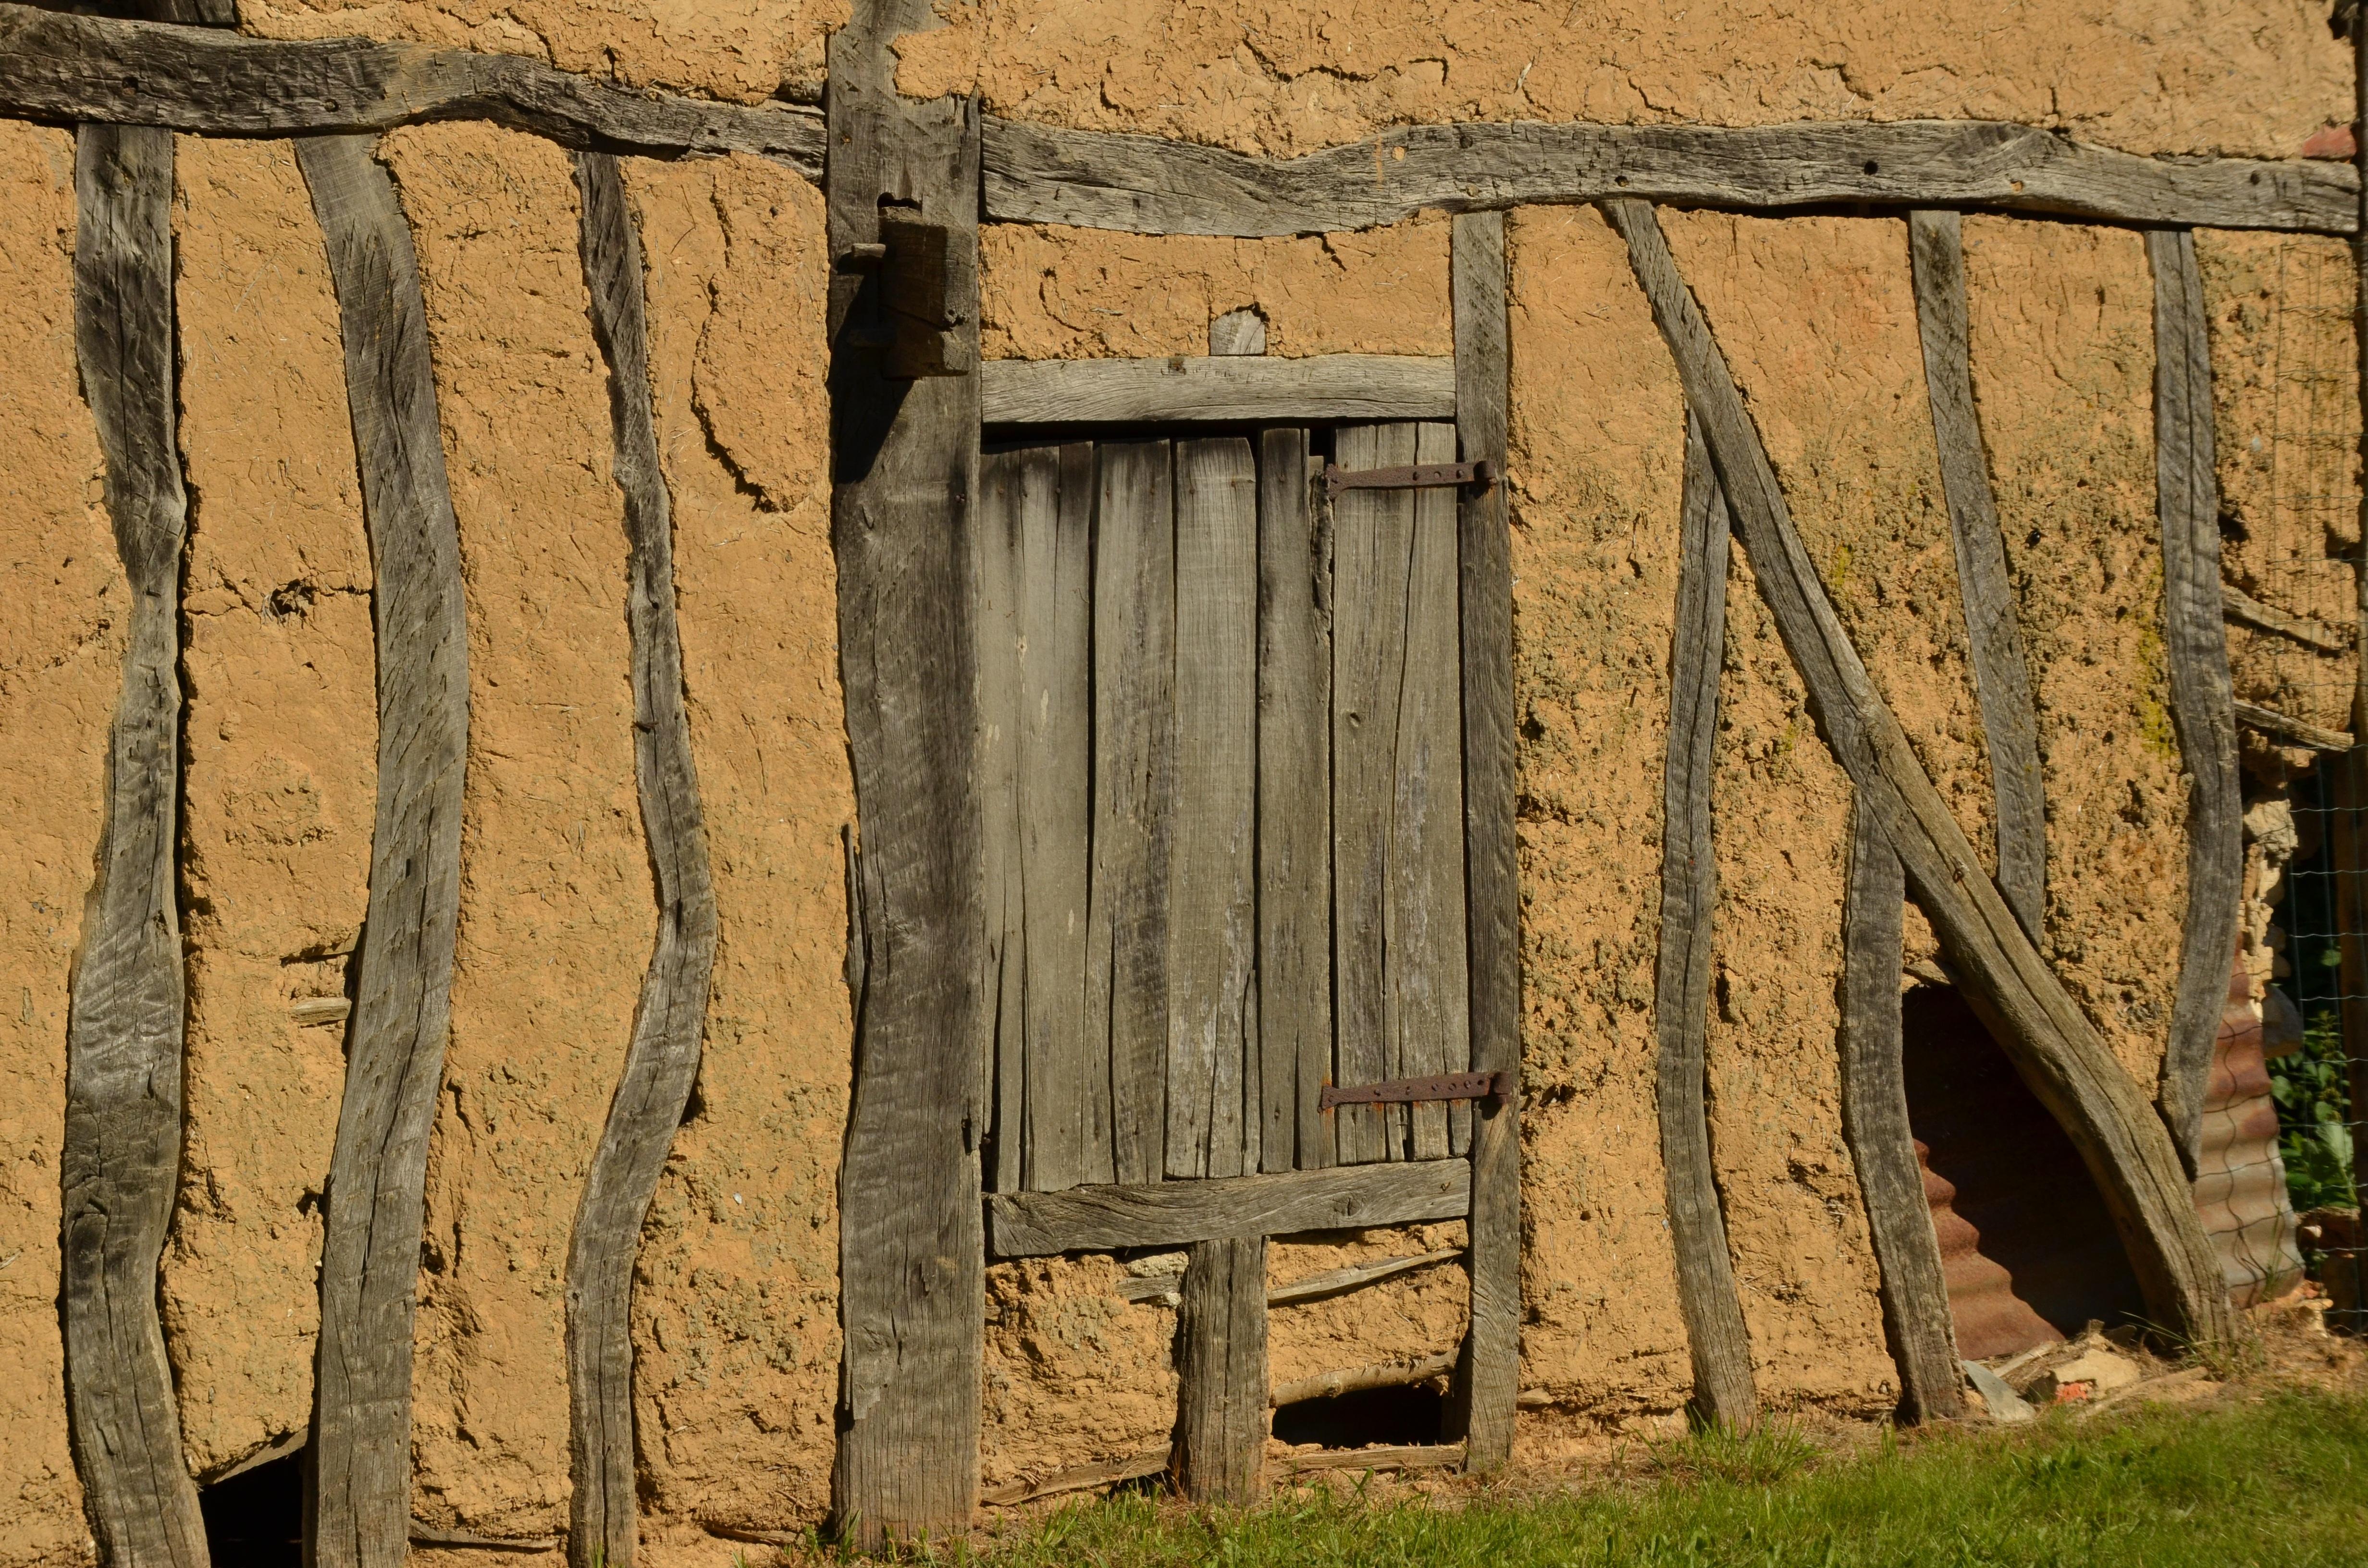 Fotos gratis : estructura, madera, antiguo, pared, bar, choza ...